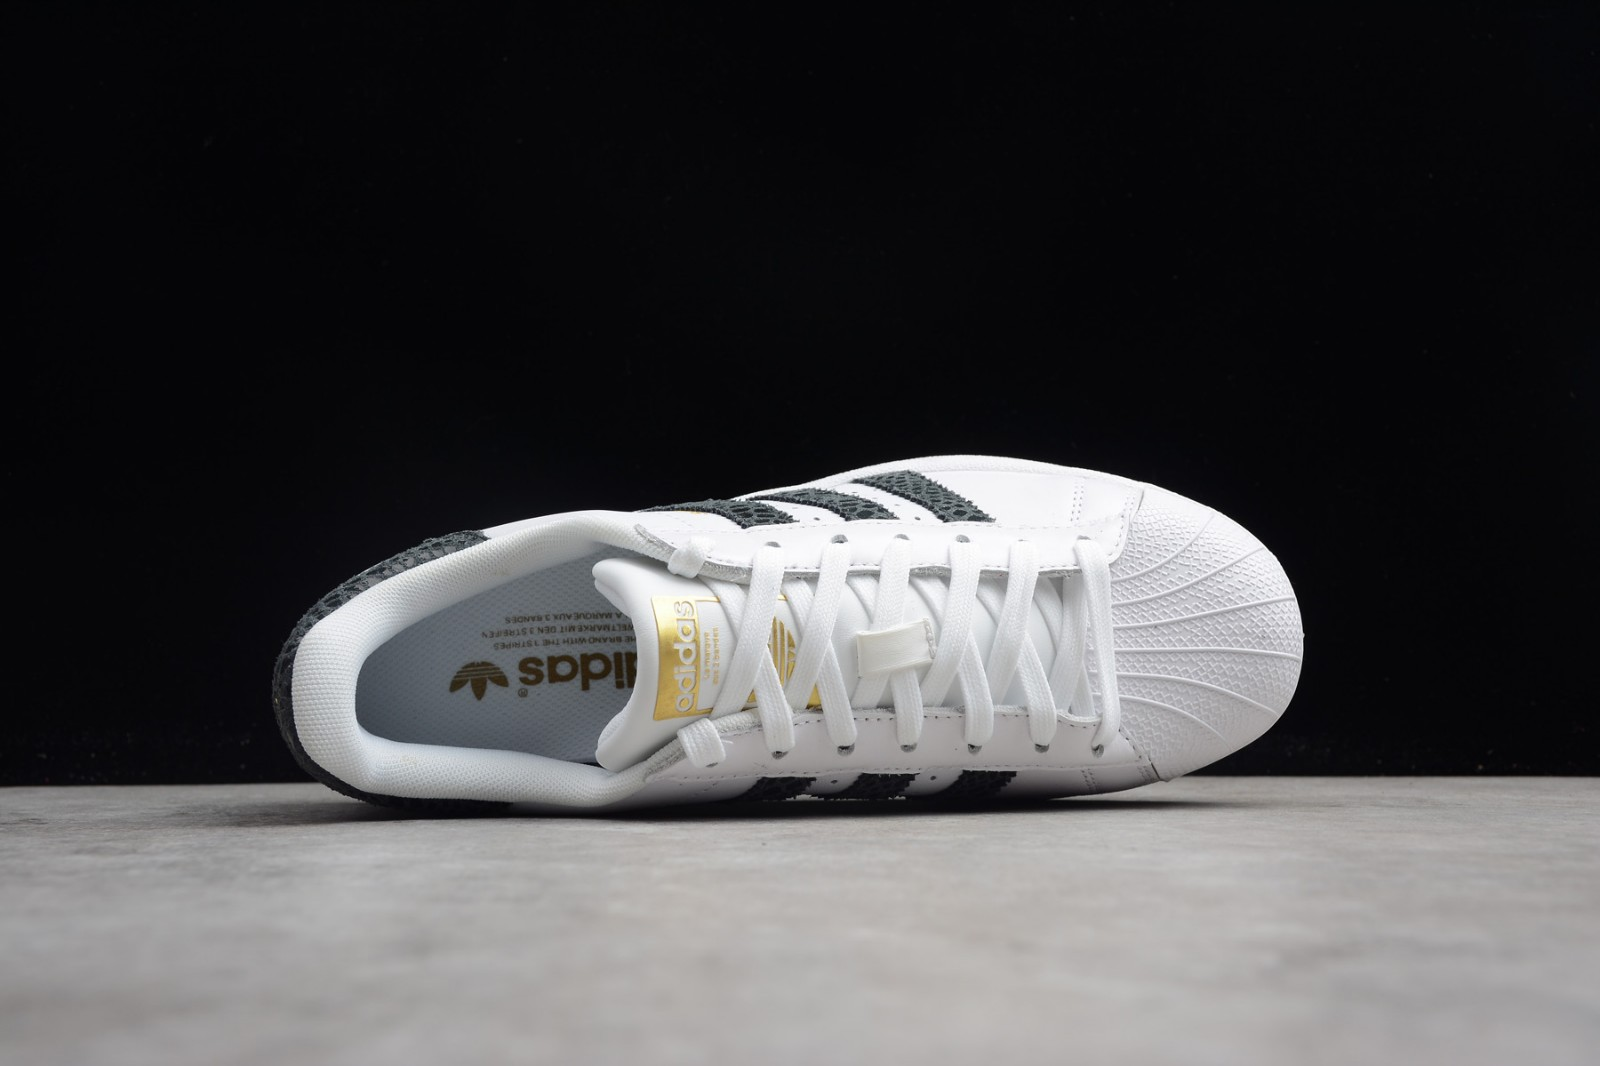 Adidas Originals Superstar Snake Stripes White Black Metallic Gold S79418